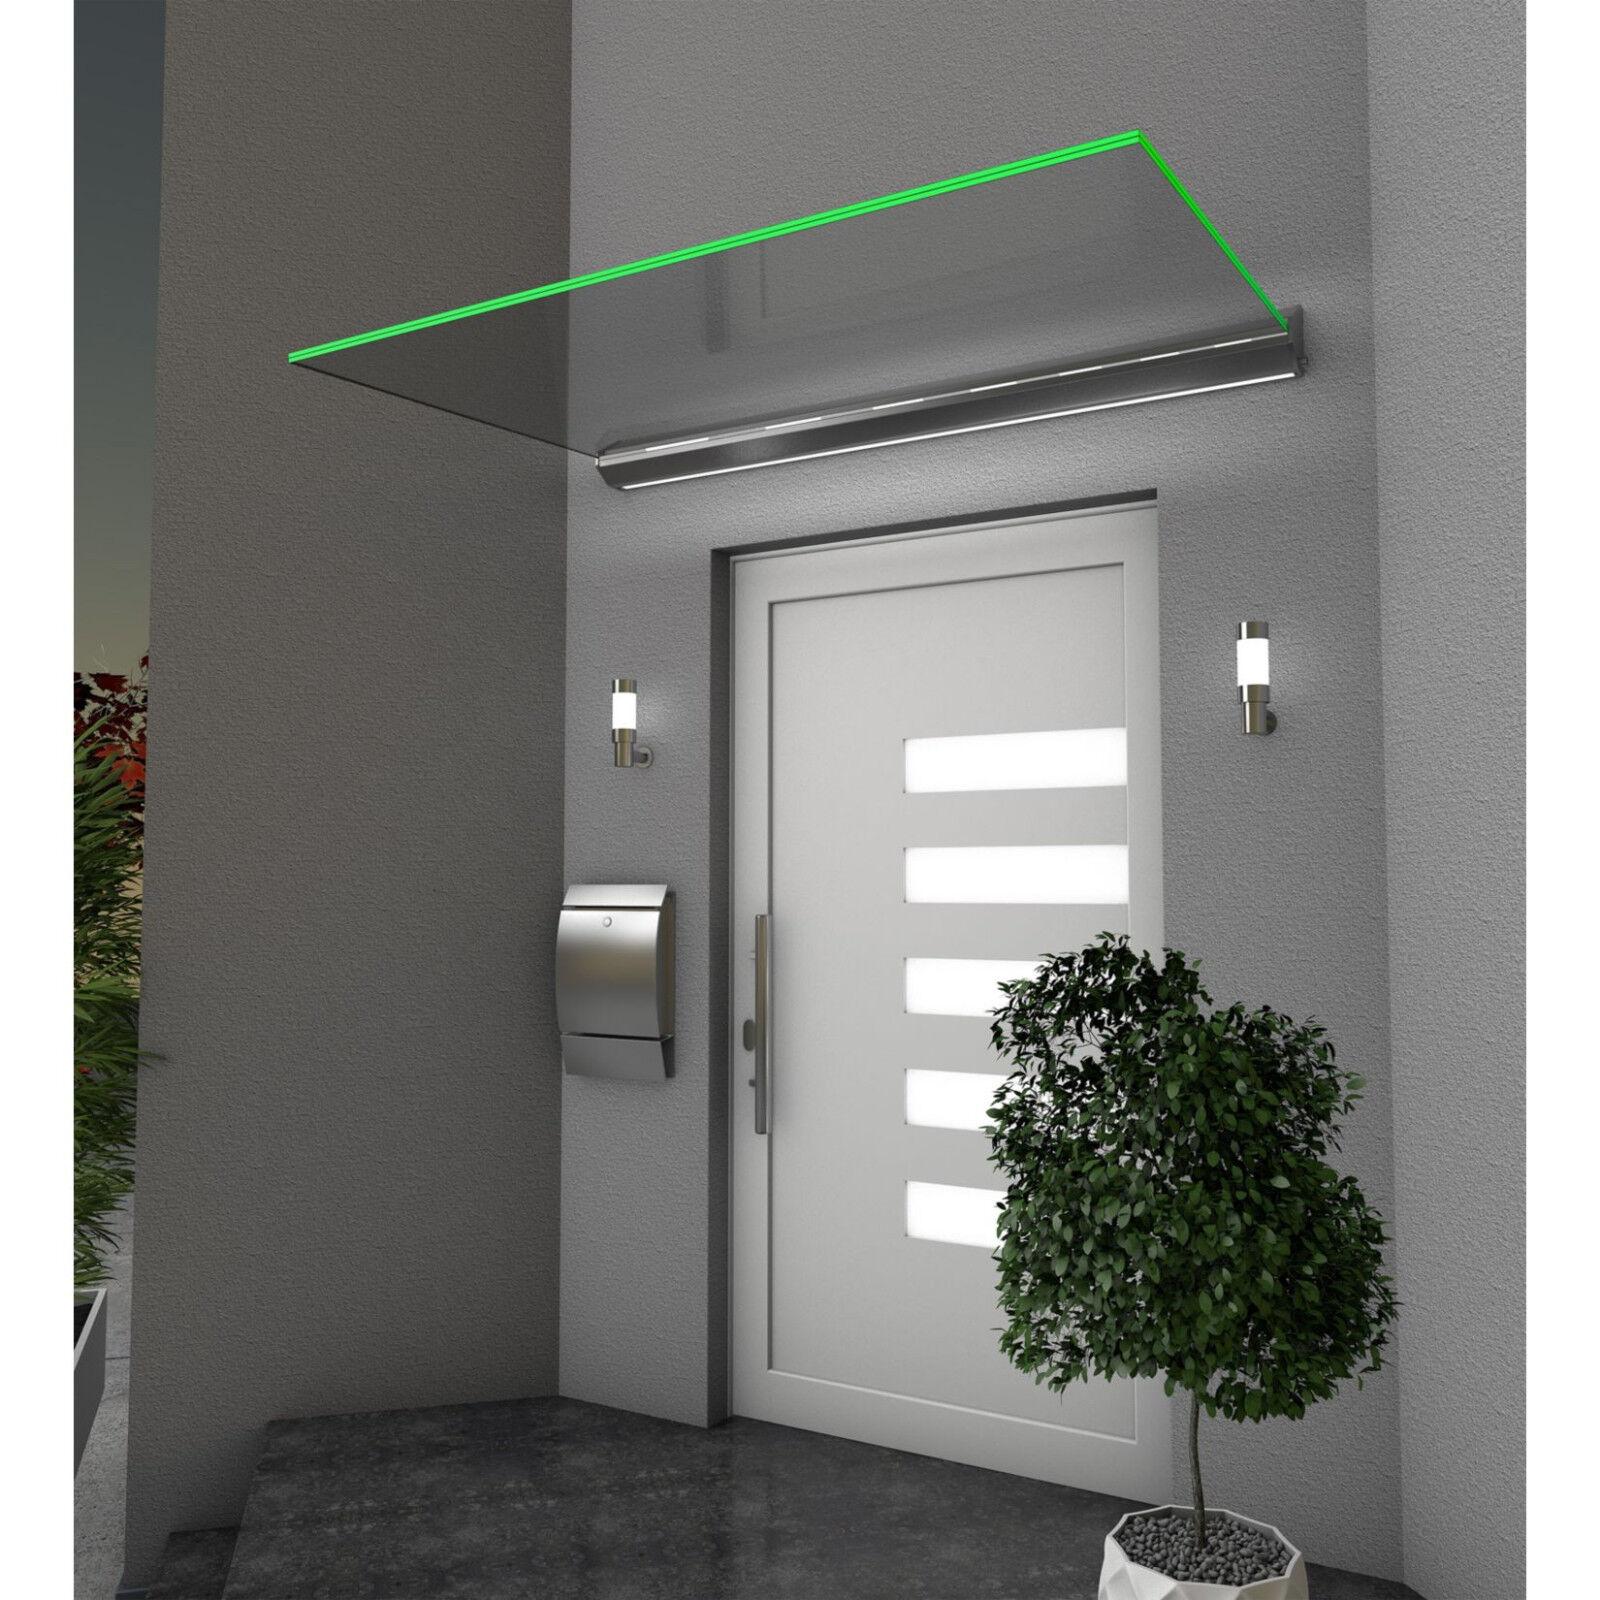 Gutta Echtglasvordach HD/LED Haustürvordach 160 x 100 x 13,5 cm (LxTxH)